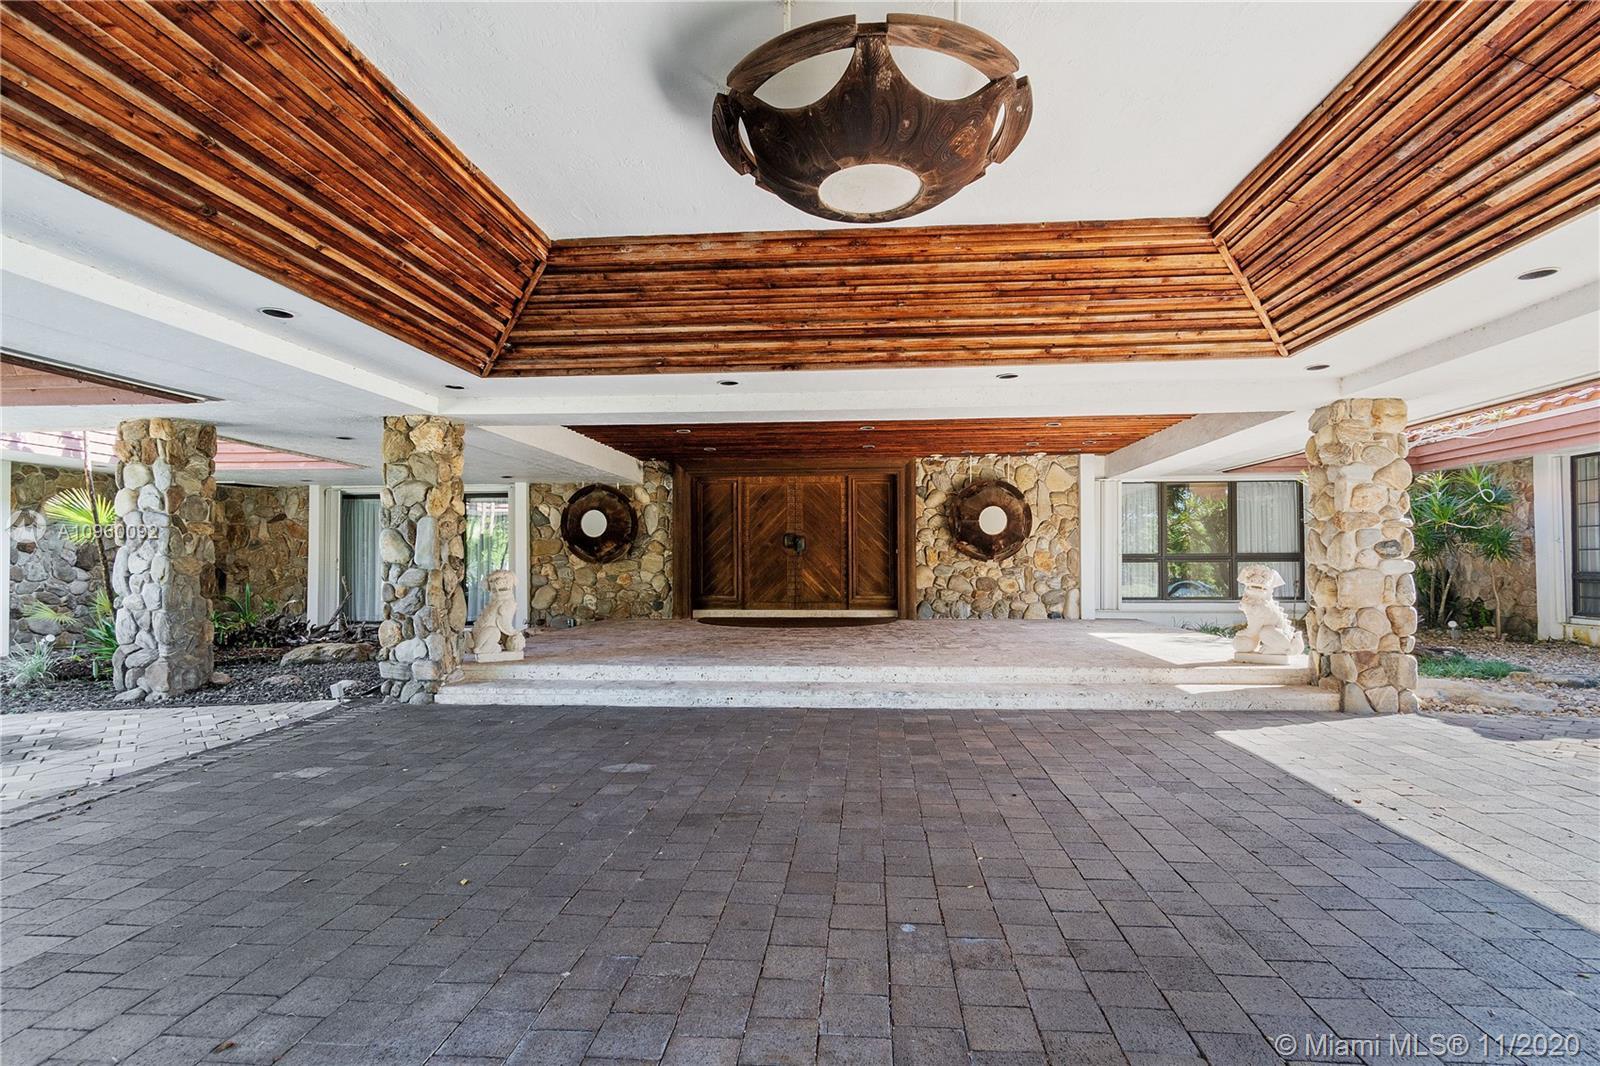 Saddle Club Estates, 16200 Saddle Club Rd, Weston, Florida 33326